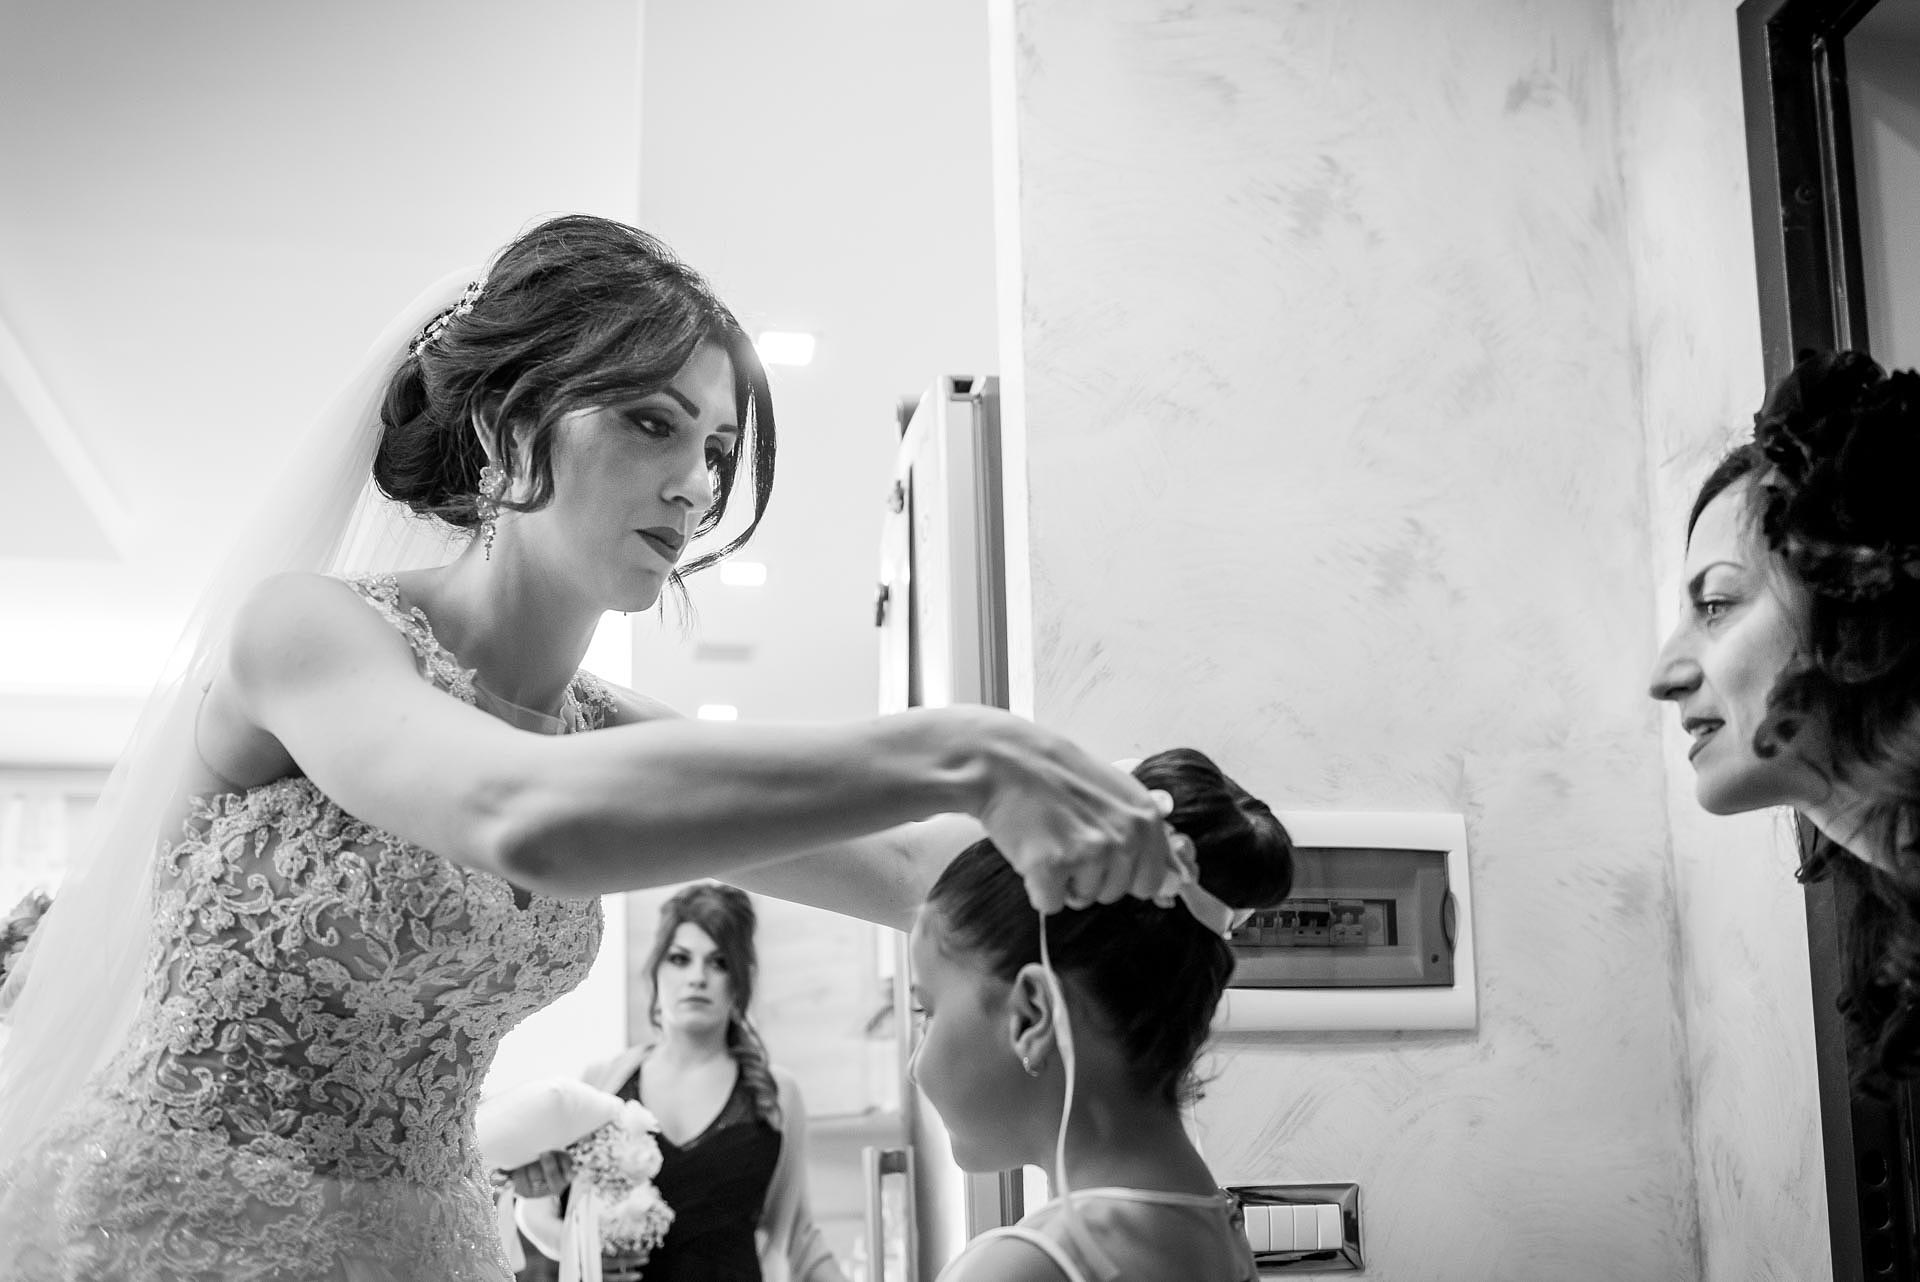 foto-preparativi-sposa-matrimonio-roma-17